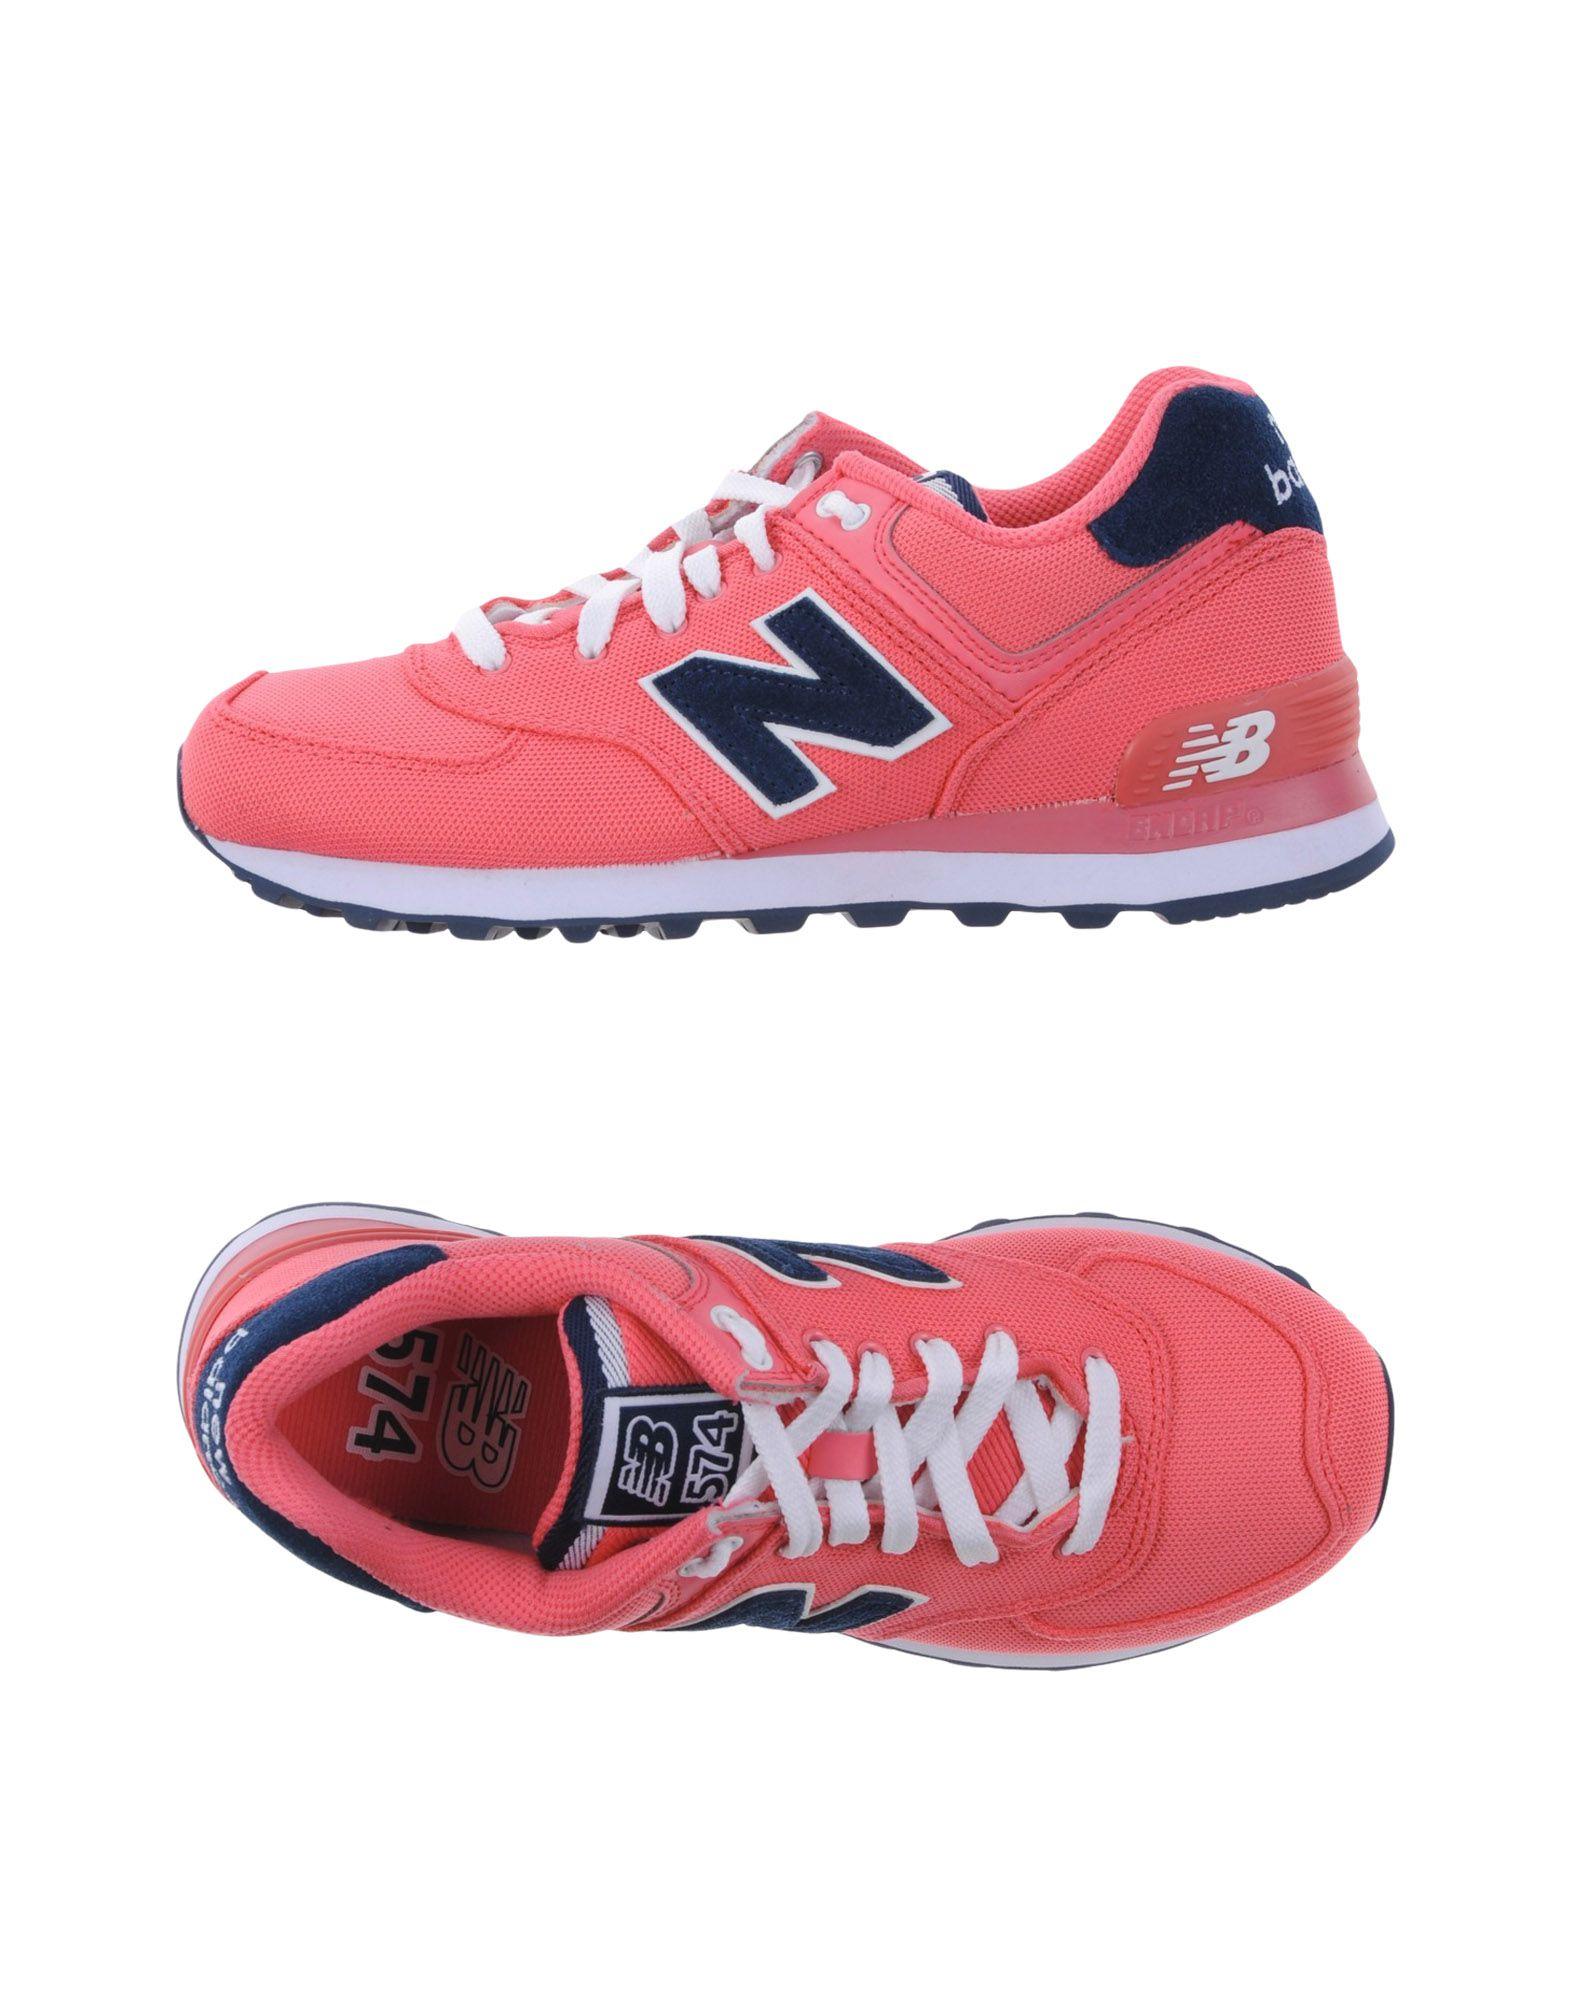 New Balance Sneakers Damen  11286911TU